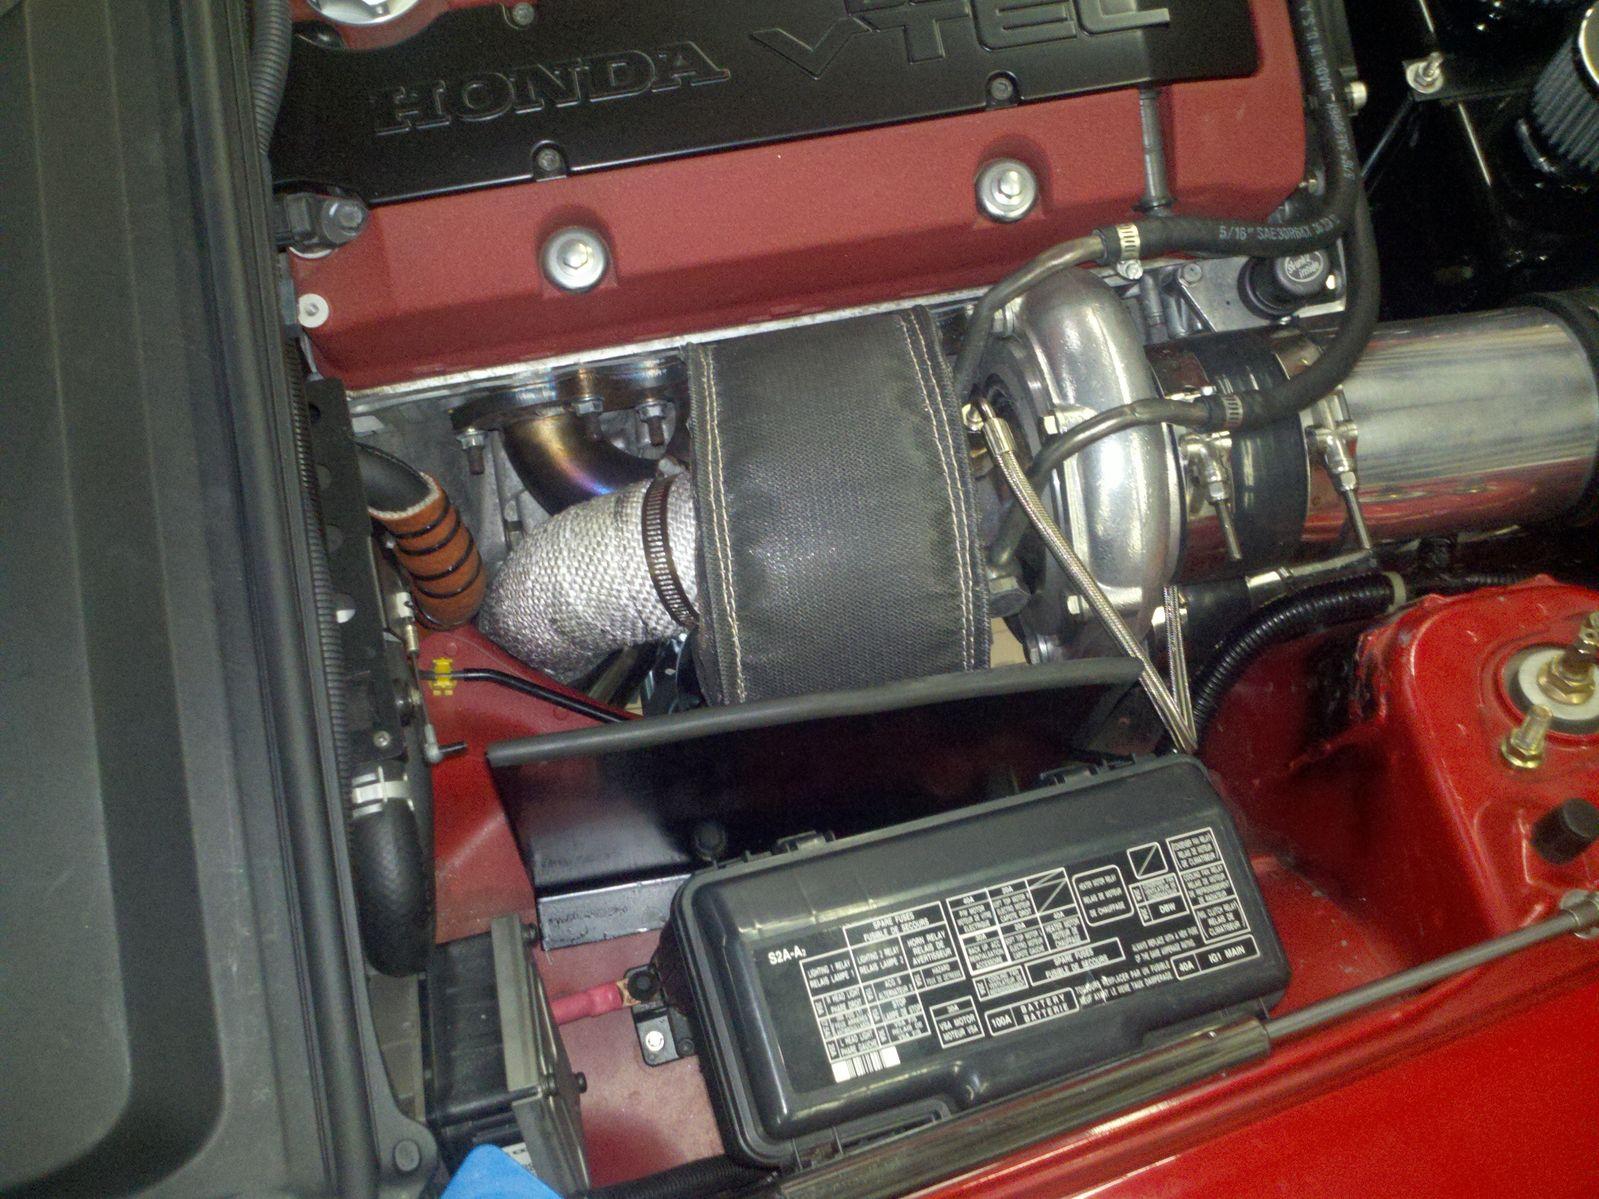 2006 Honda S2000 Fuse Panel Diagram Wiring Diagram Photos For Help